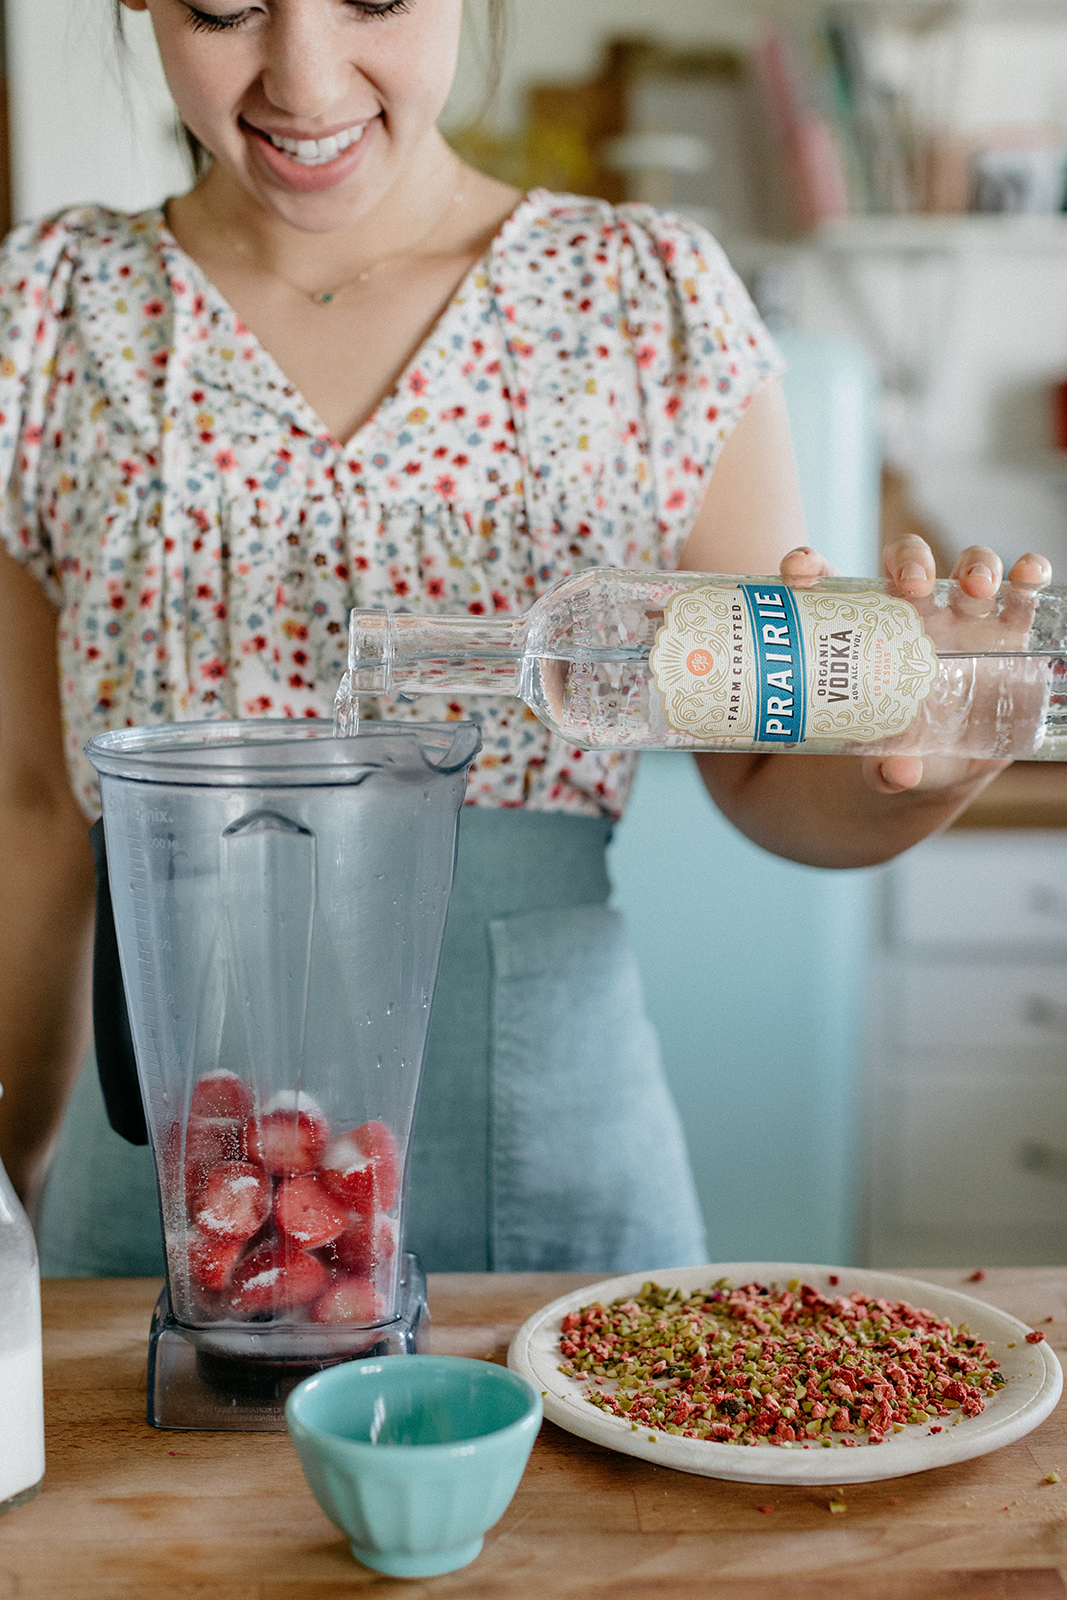 molly-yeh-prairie-vodka-strawberries-_-cream-9.jpg